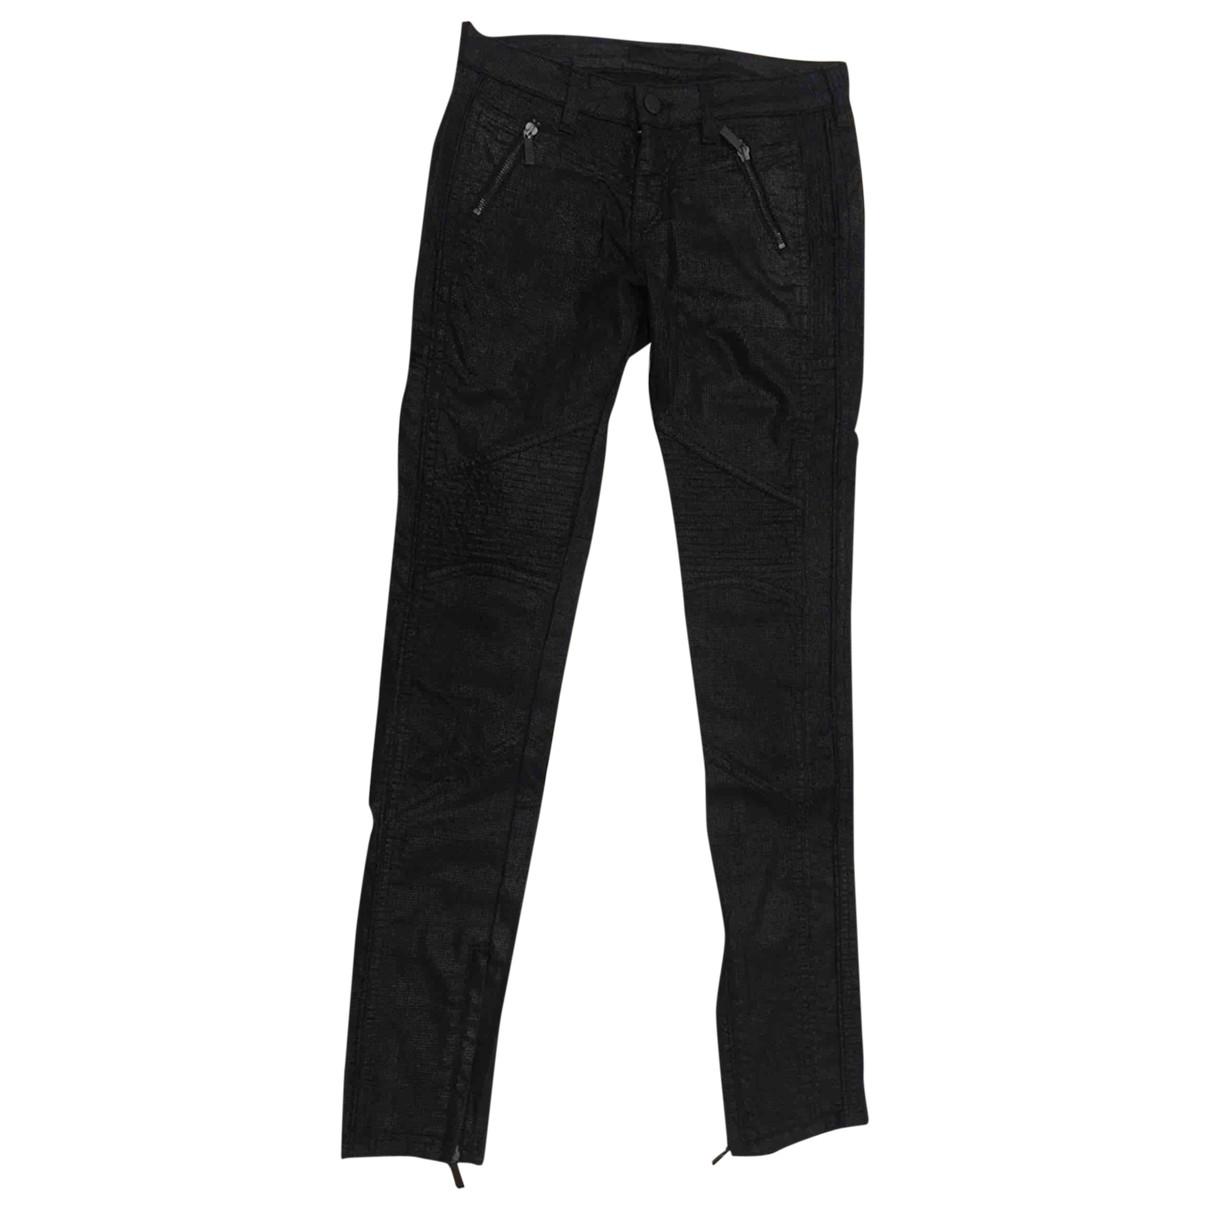 Karl Lagerfeld \N Black Cotton - elasthane Jeans for Women 26 US